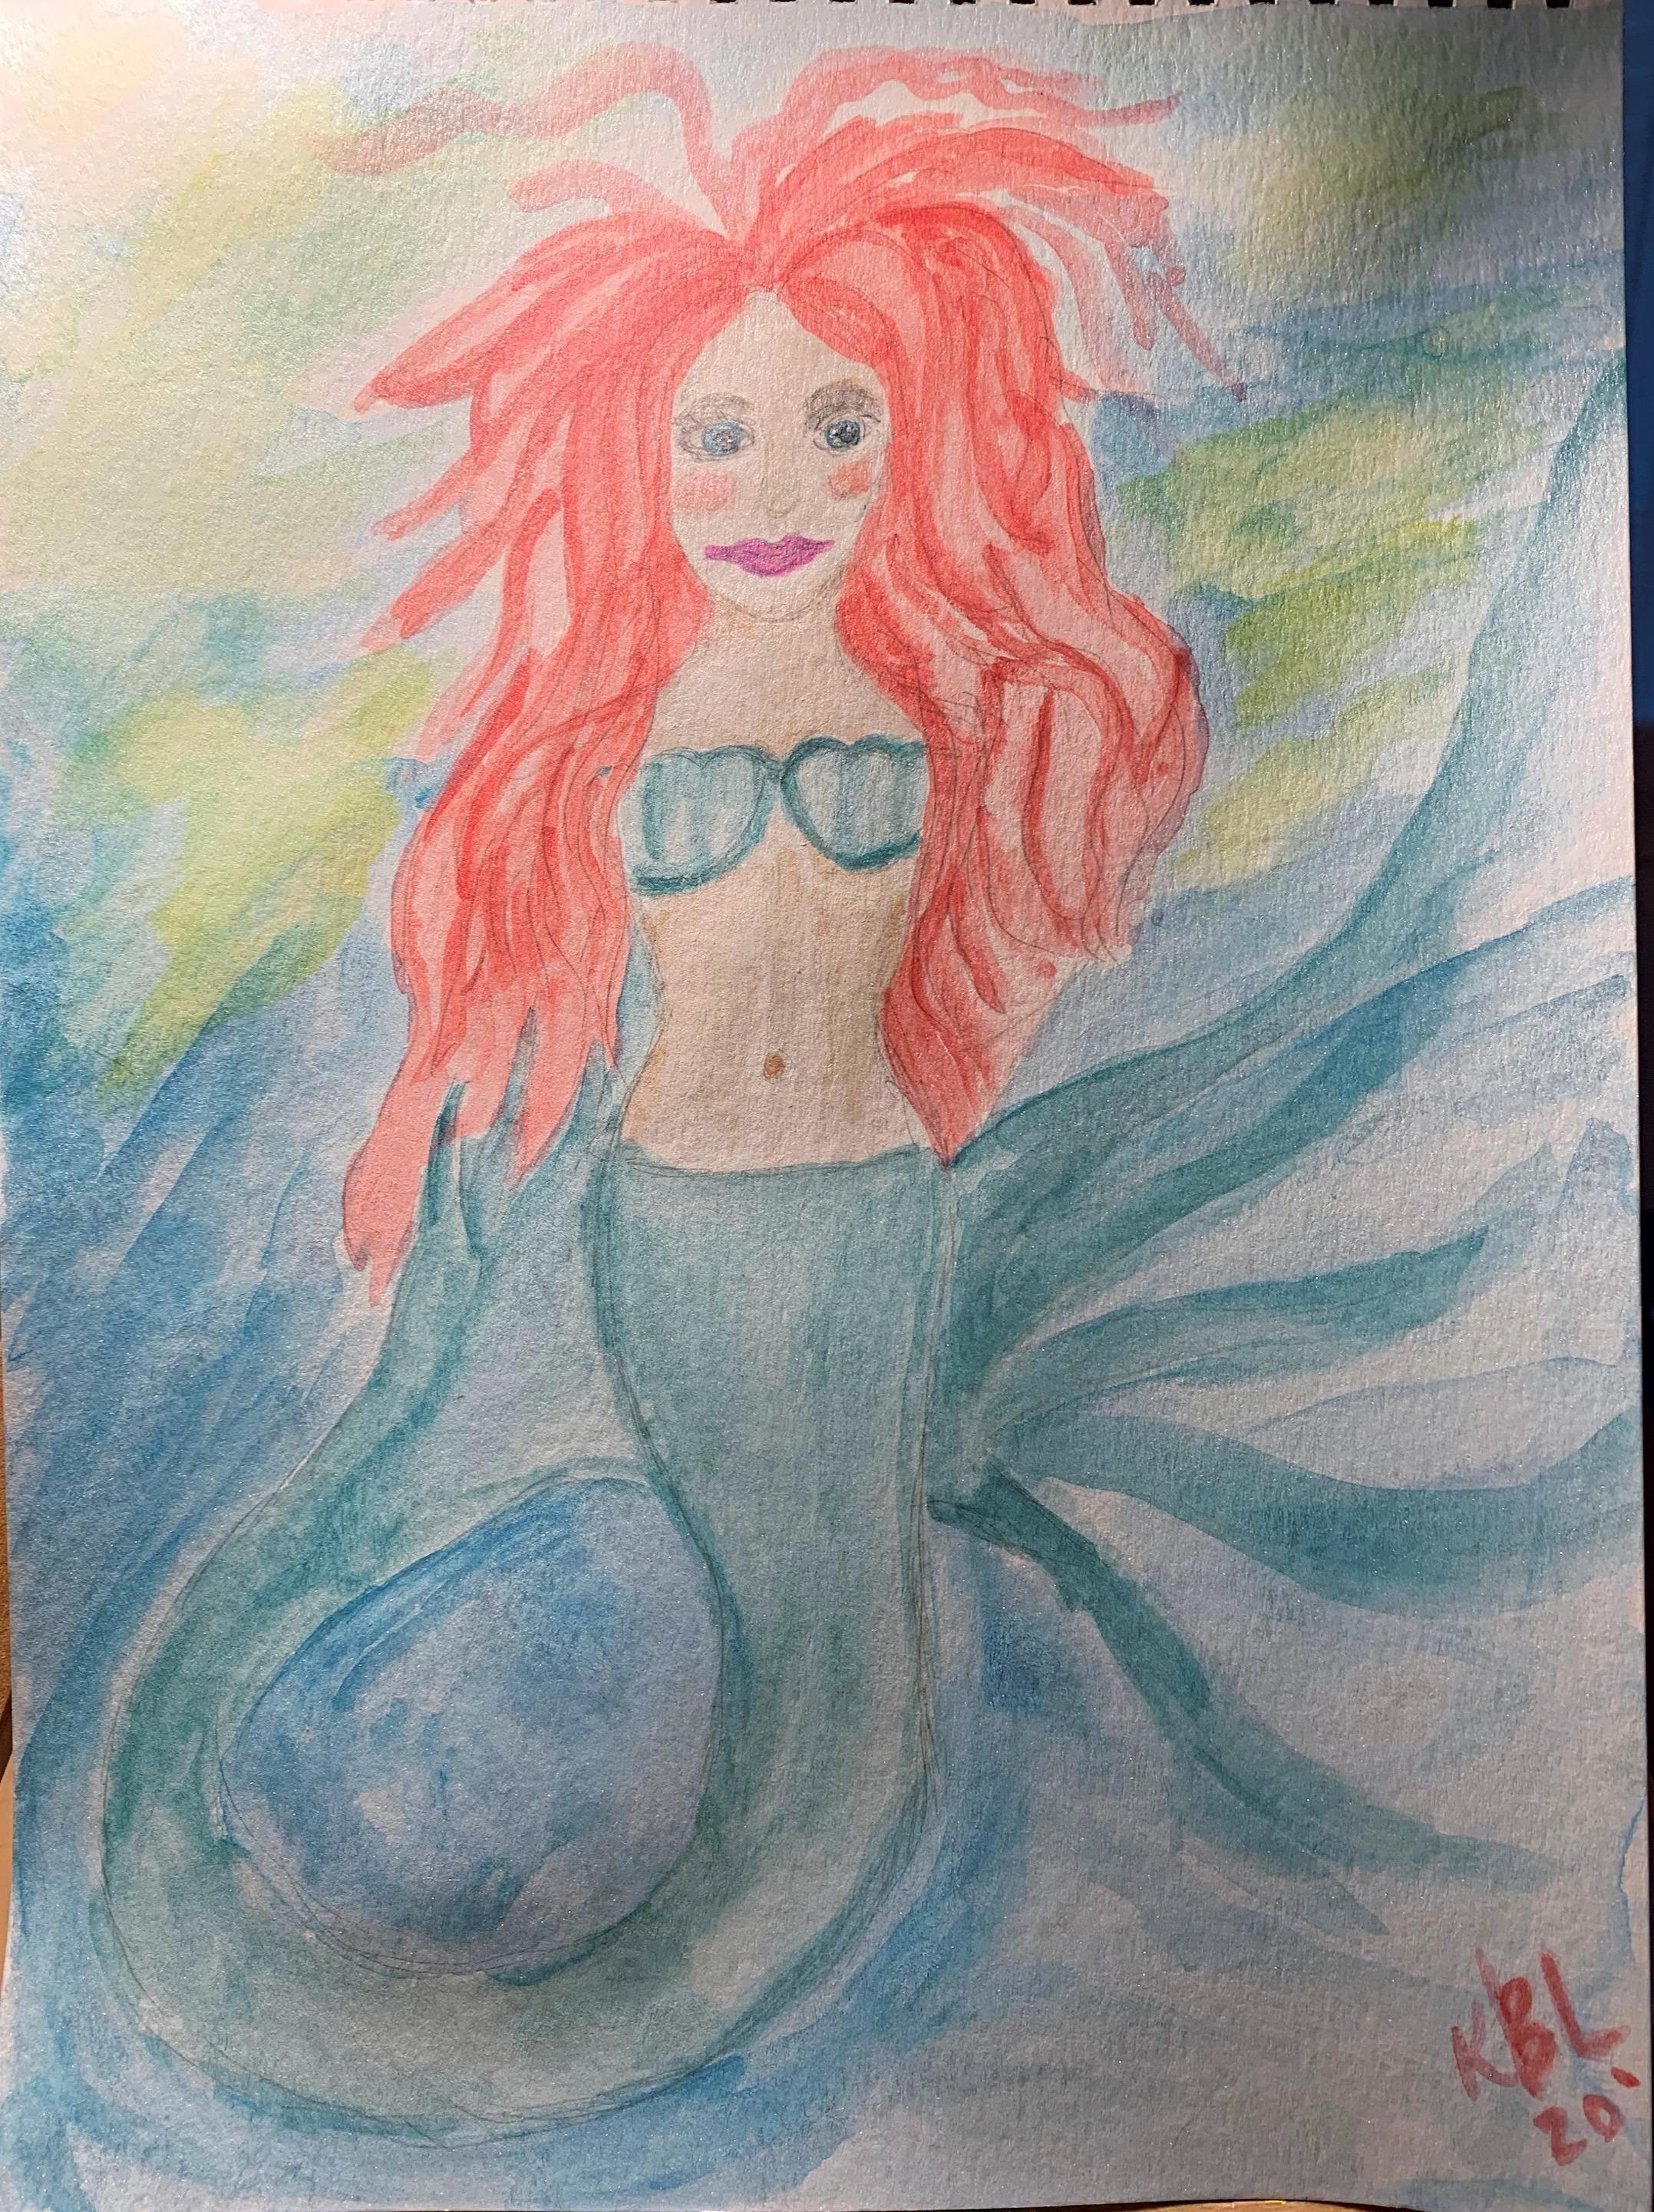 Little Mermaid with Big Hair